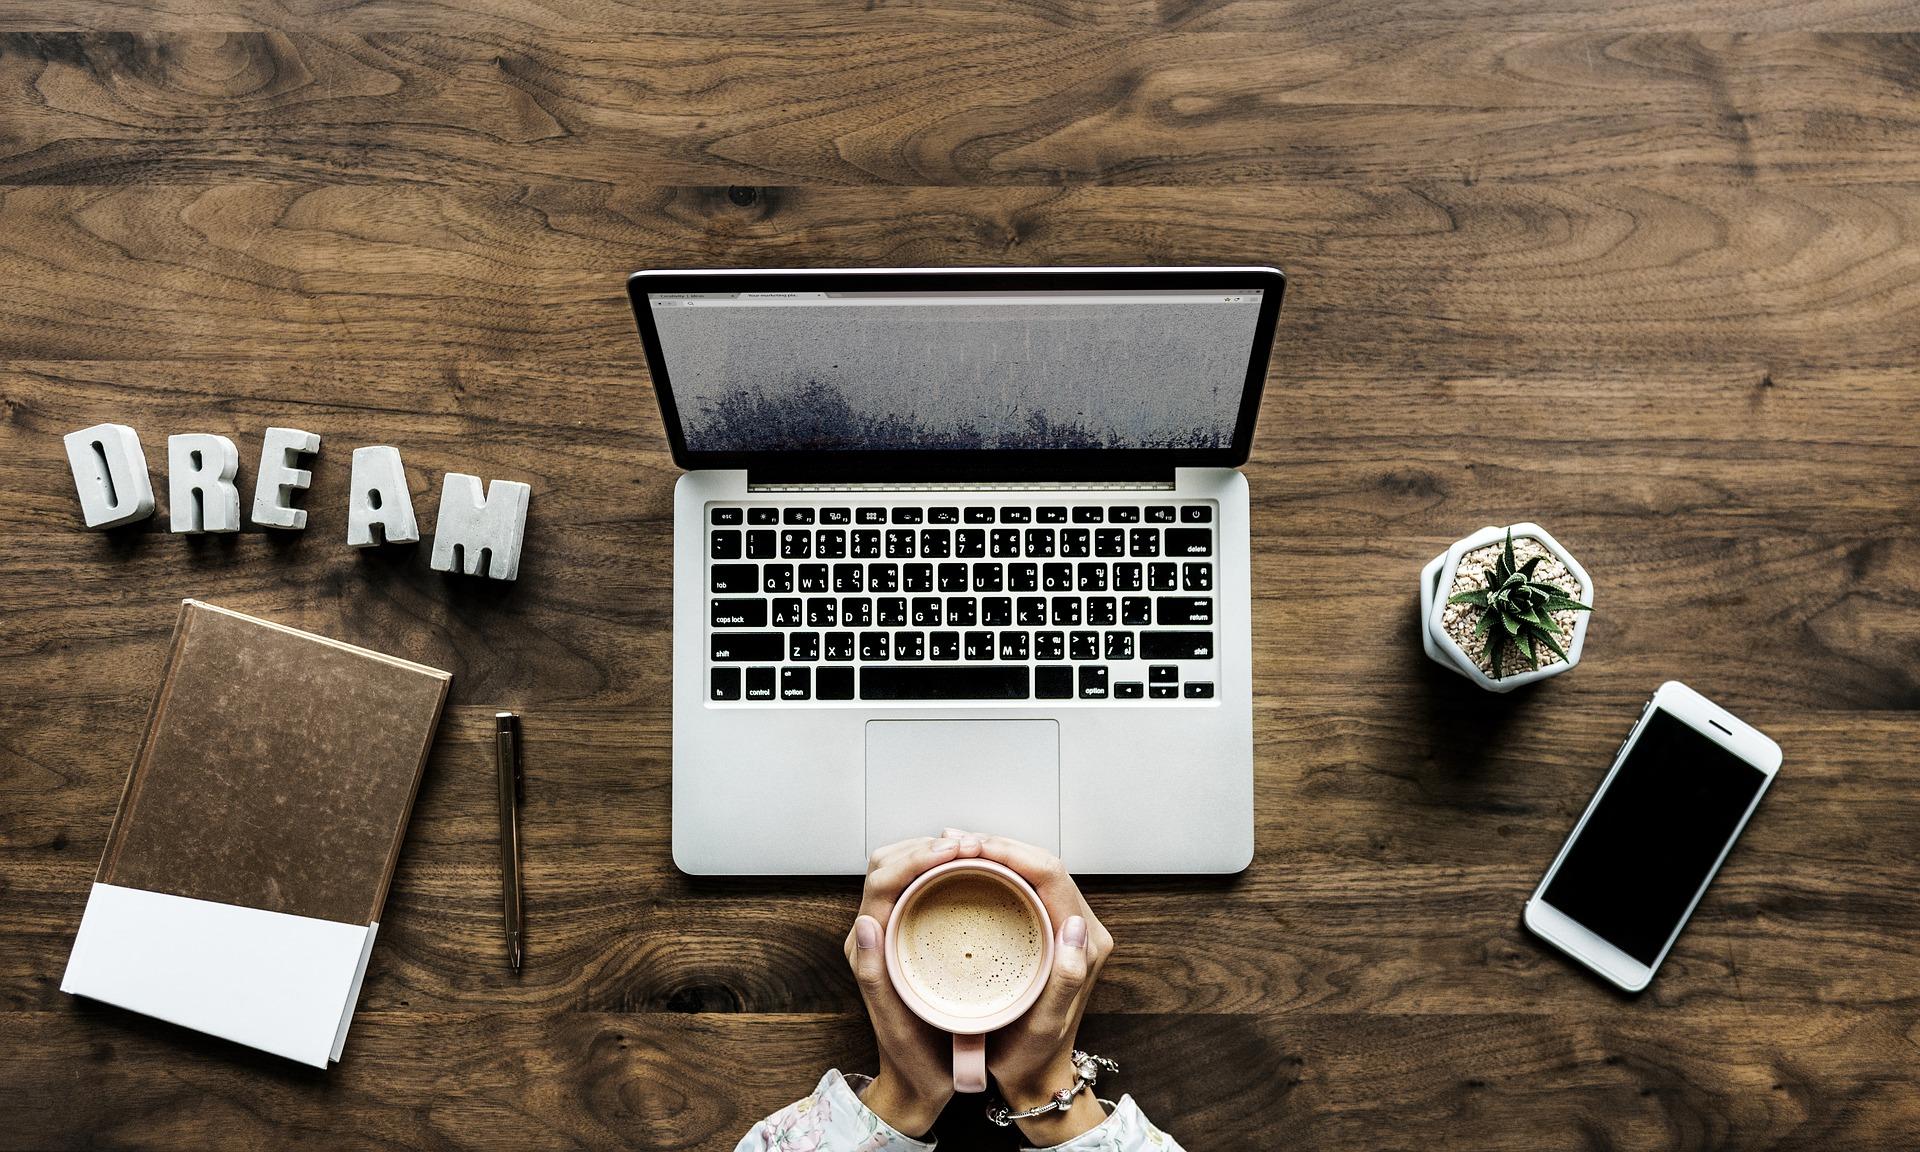 Laptop | pixabay.com CC0